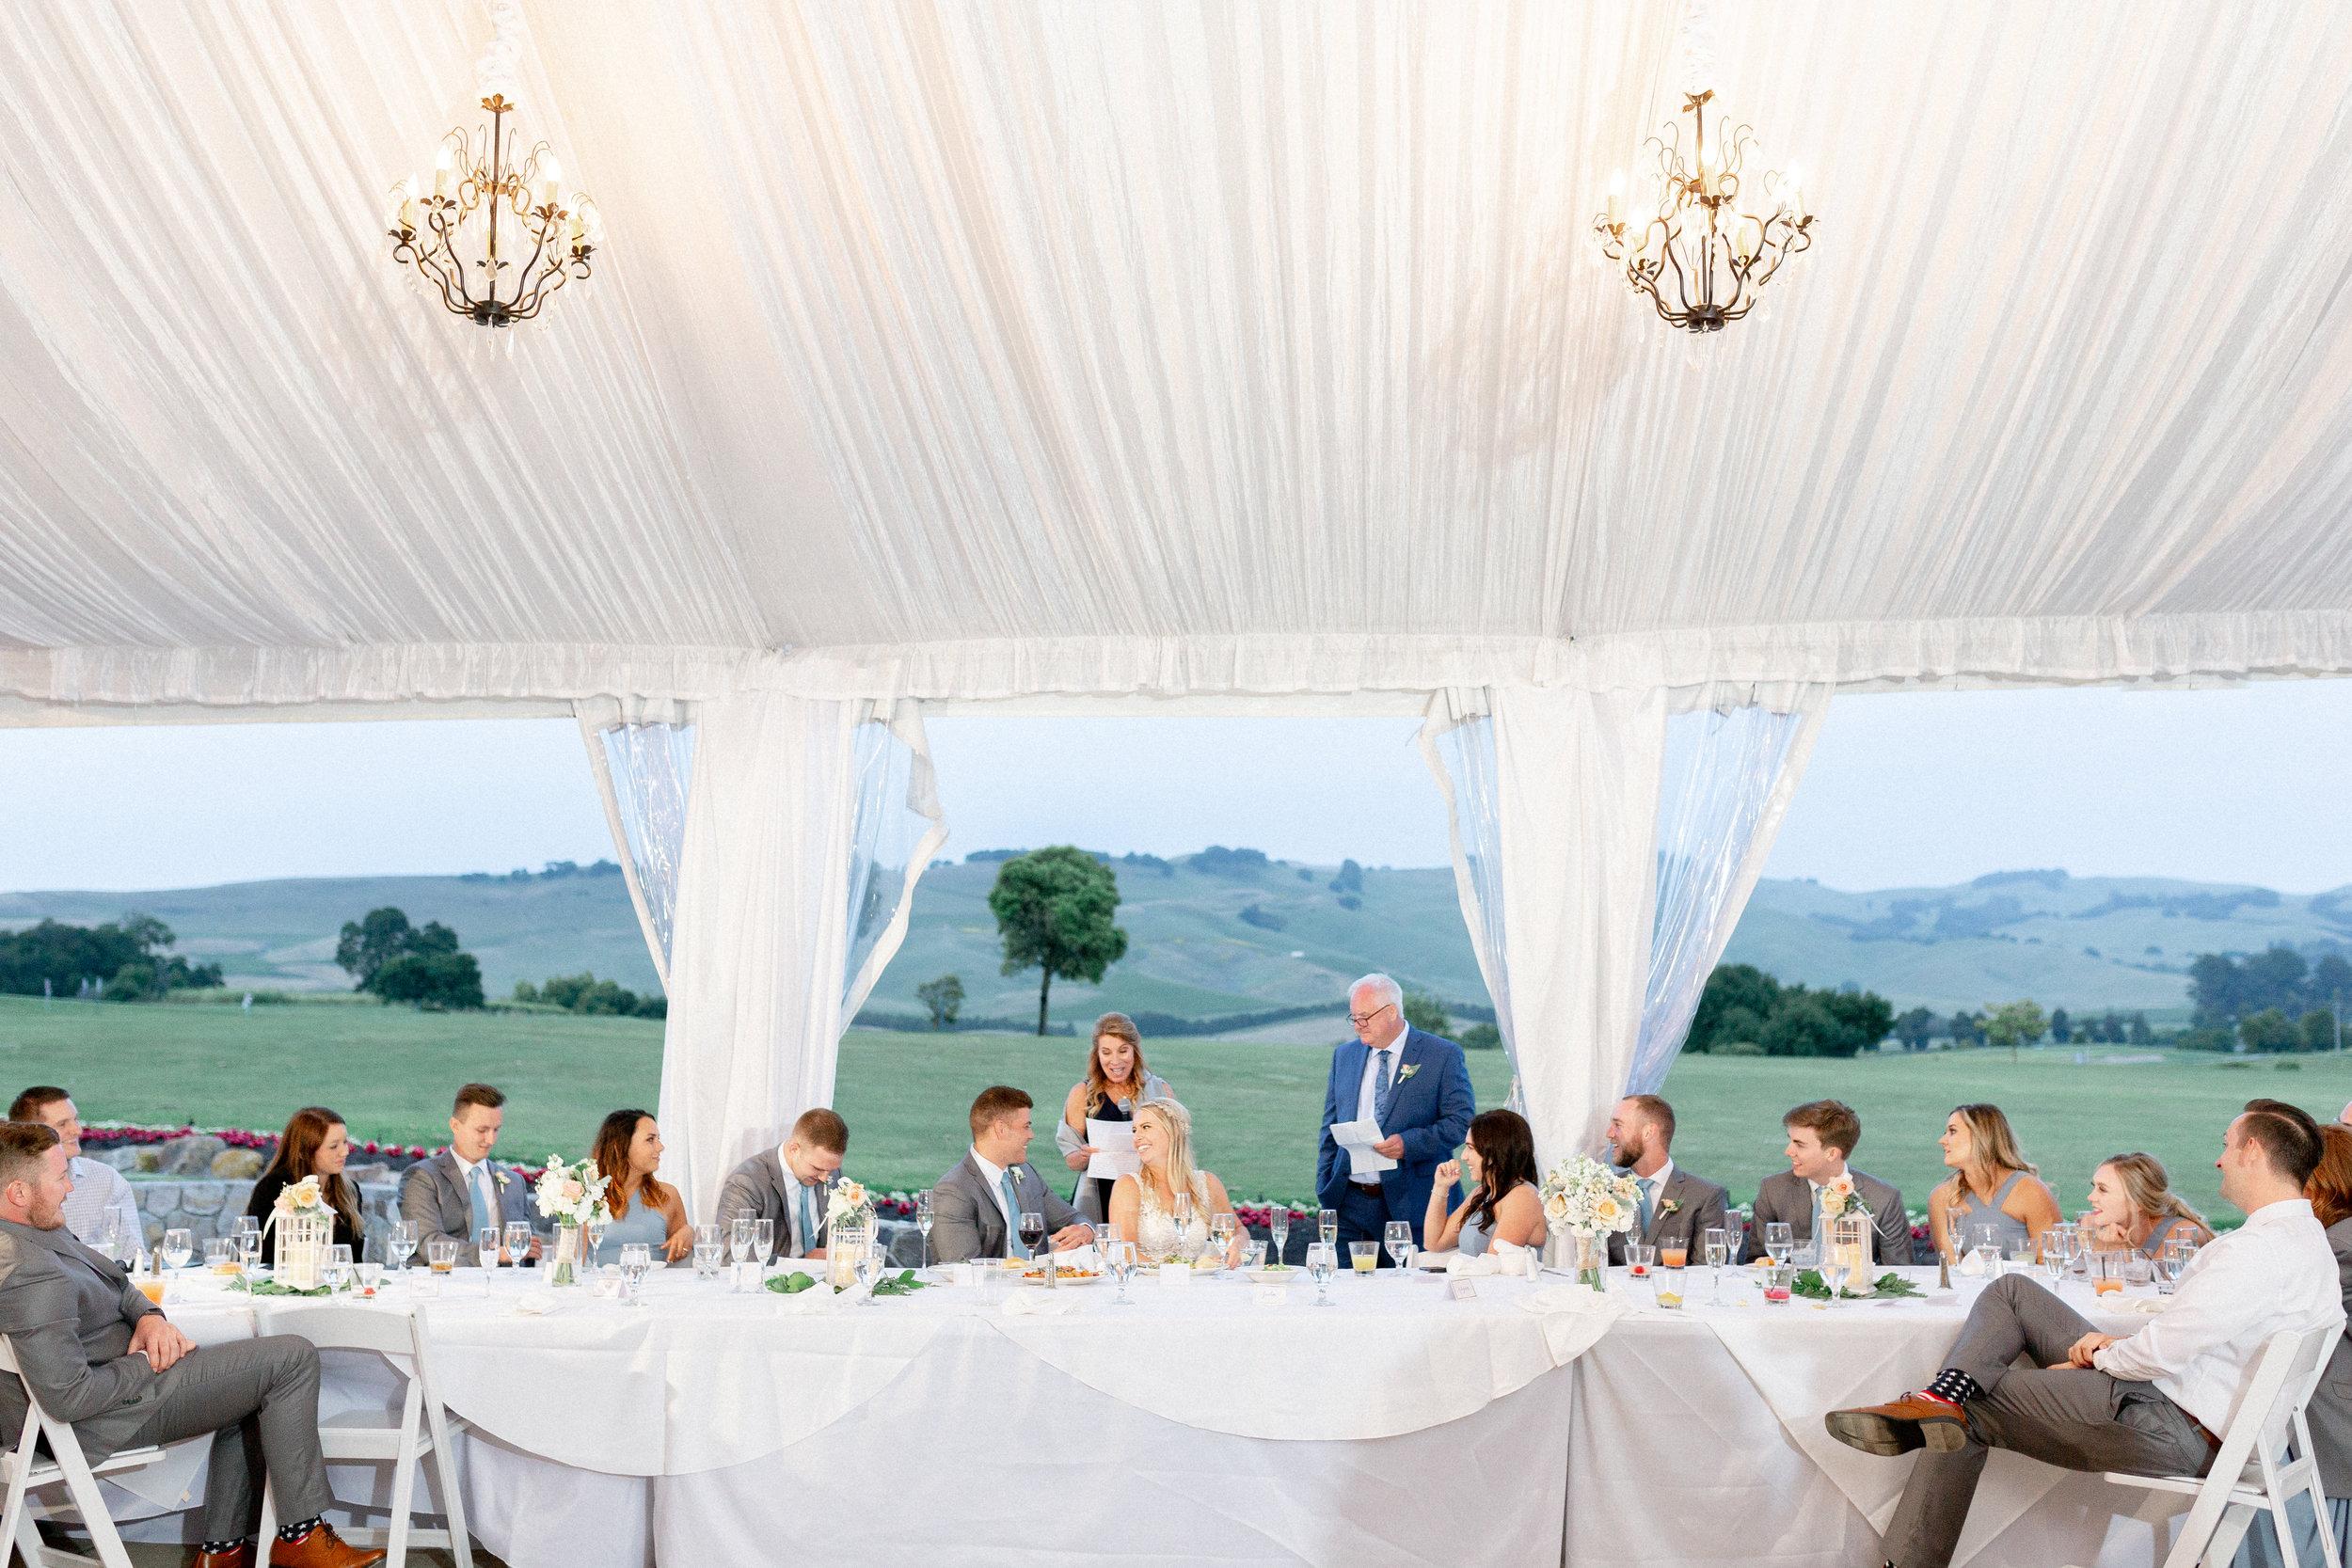 Eagle-Vines-Golf-Course-wedding-photographer (187 of 206).jpg